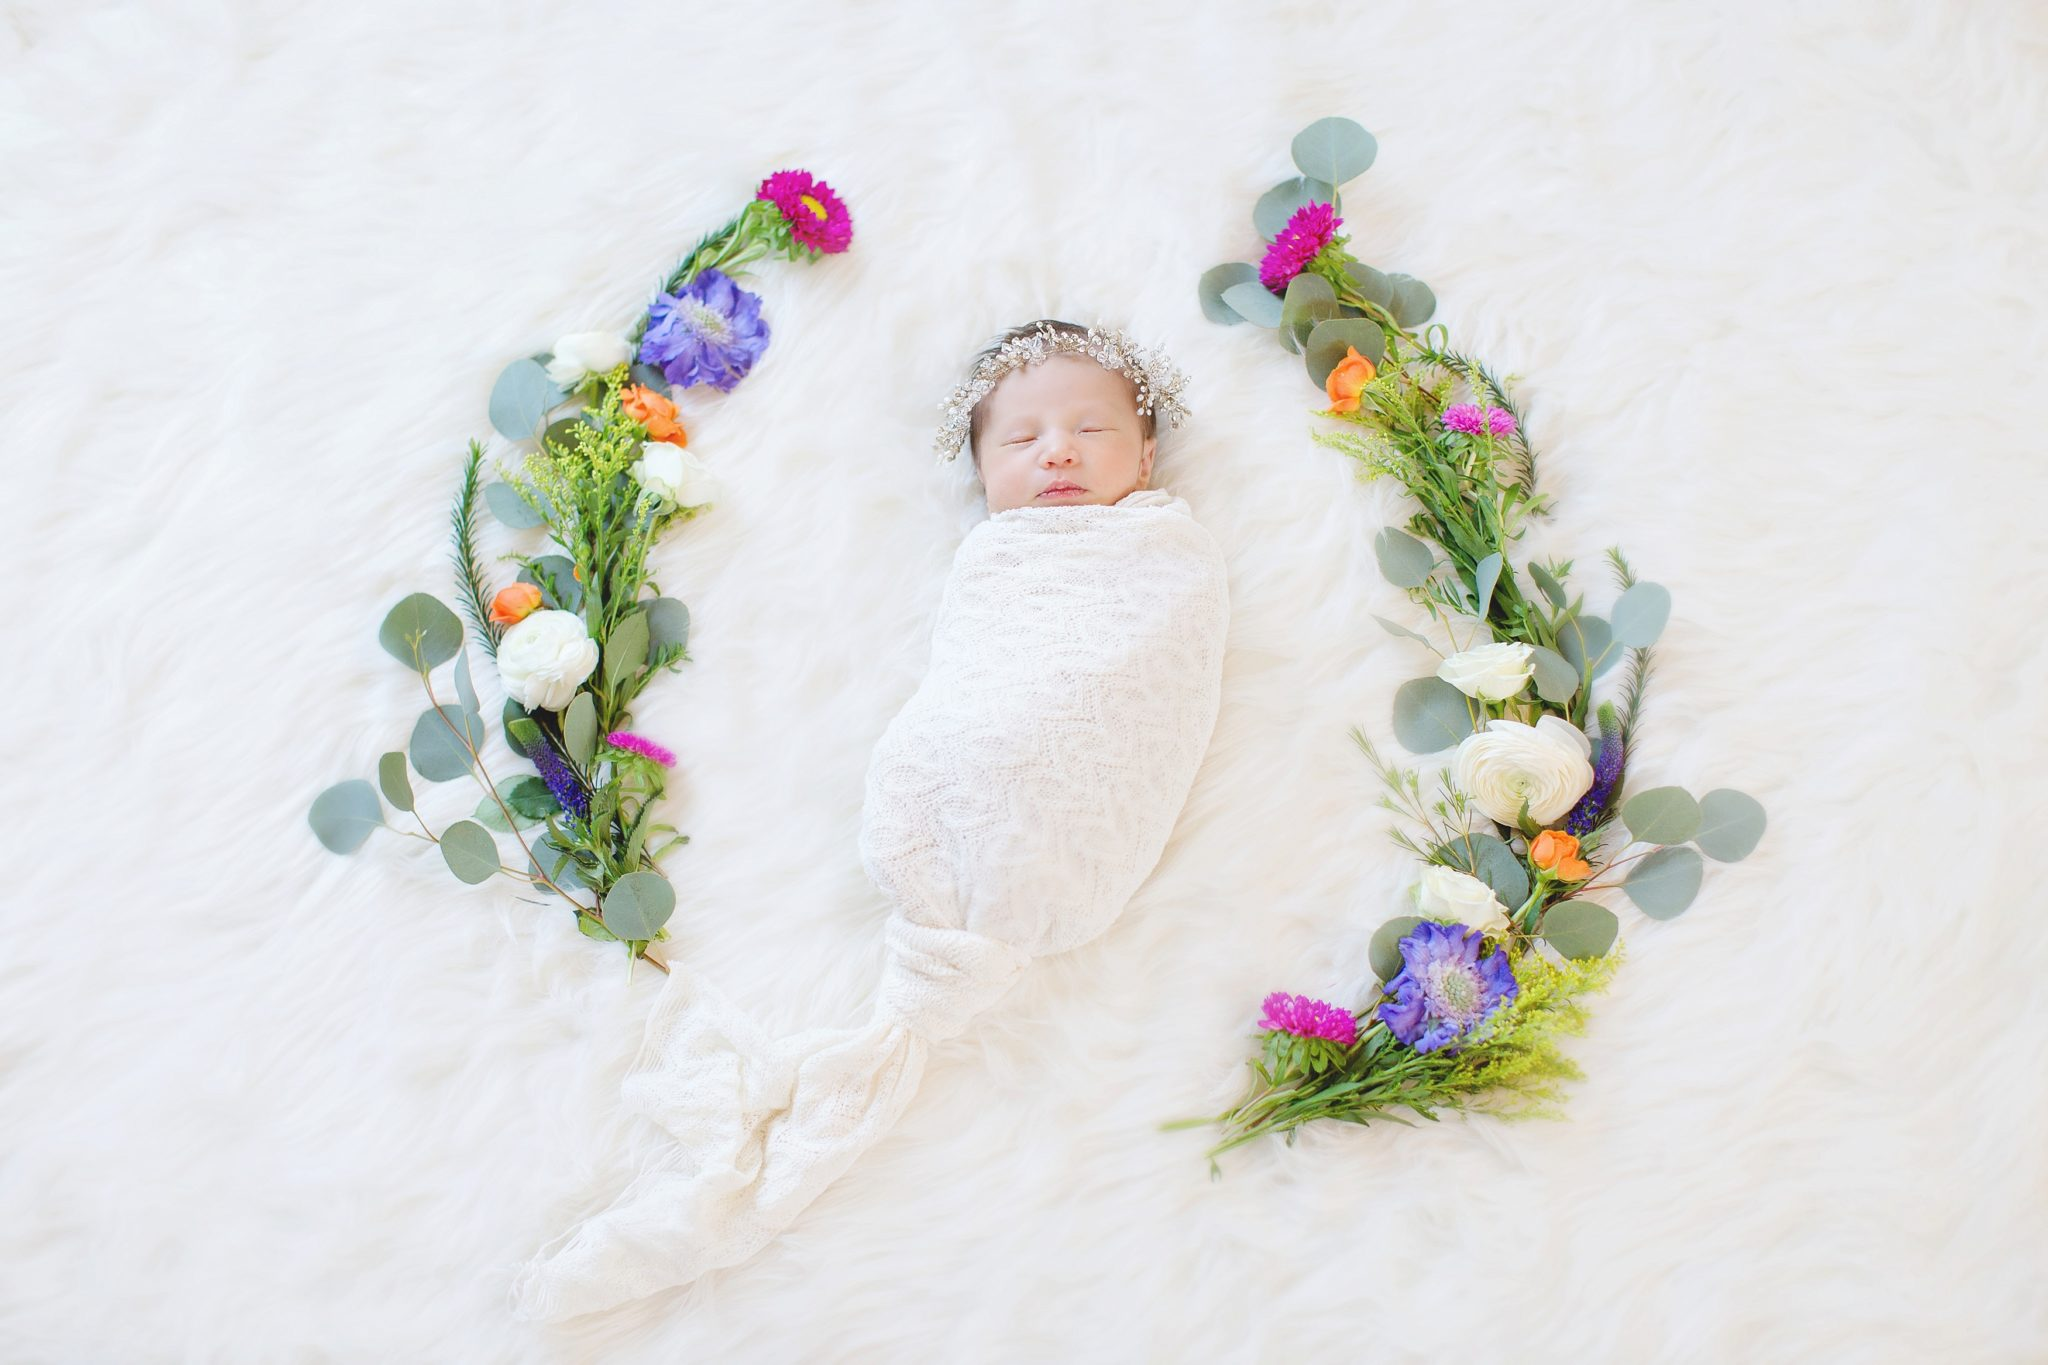 teagan_newborn_6